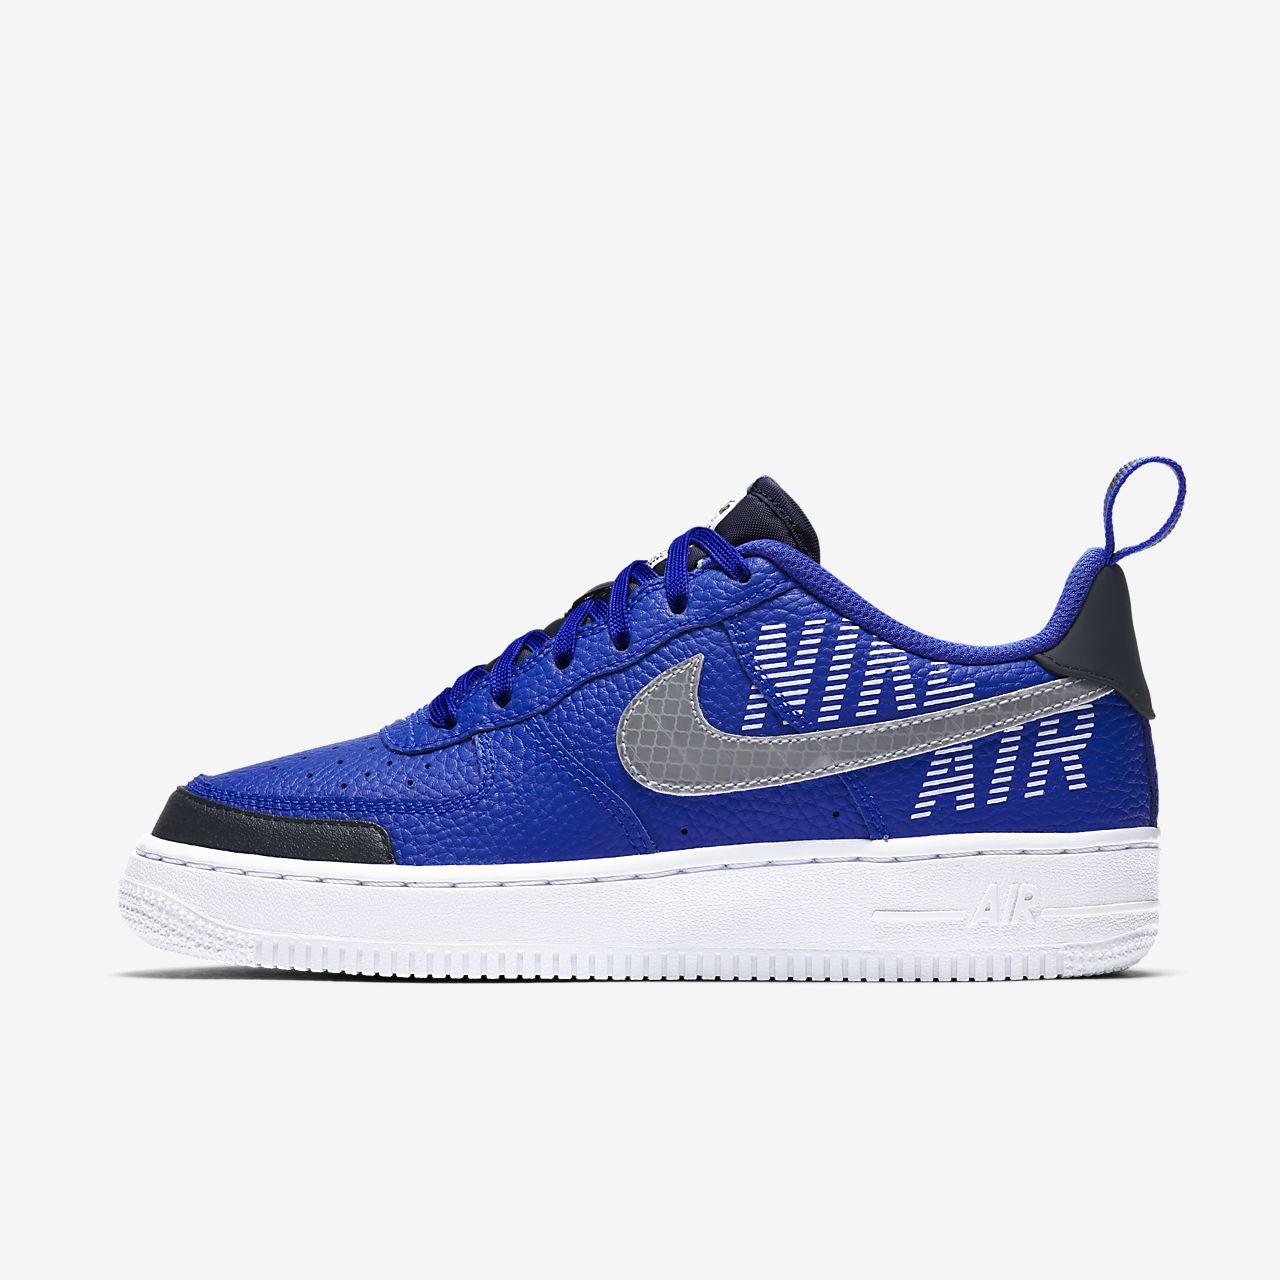 Nike Air Force 1 LV8 2-sko til store børn